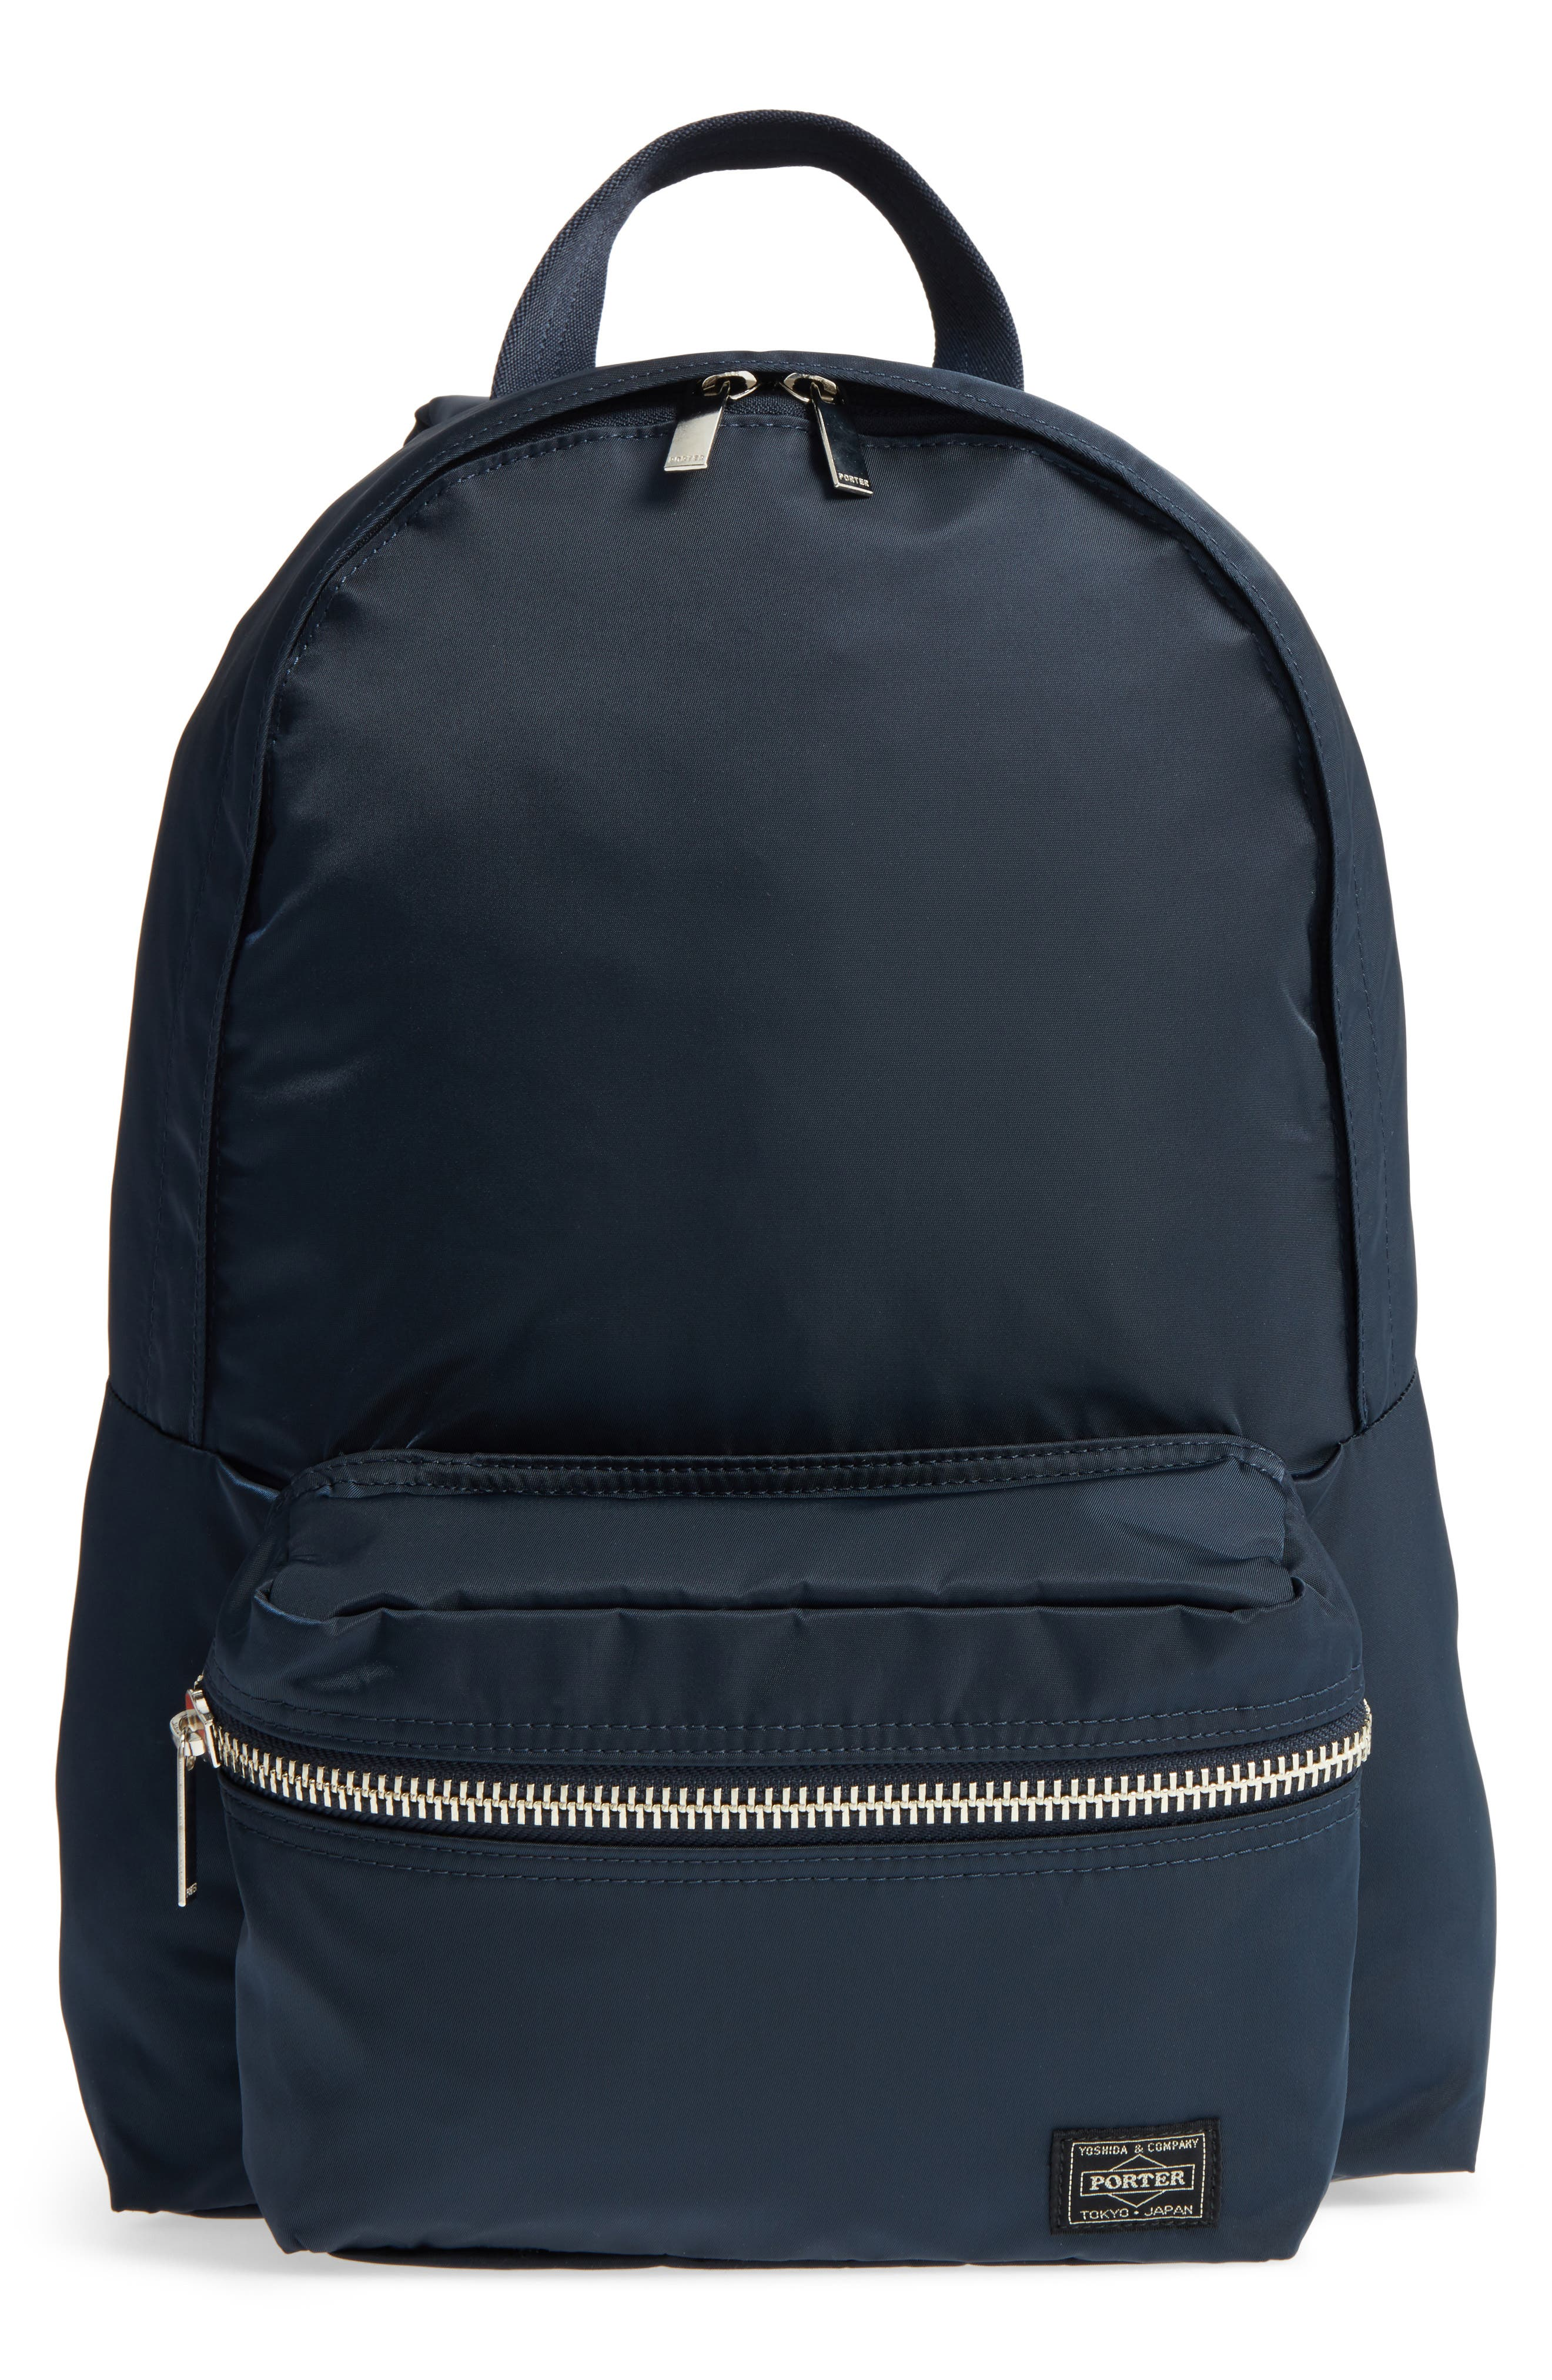 Porter-Yoshida & Co. Daily Backpack,                             Main thumbnail 1, color,                             400